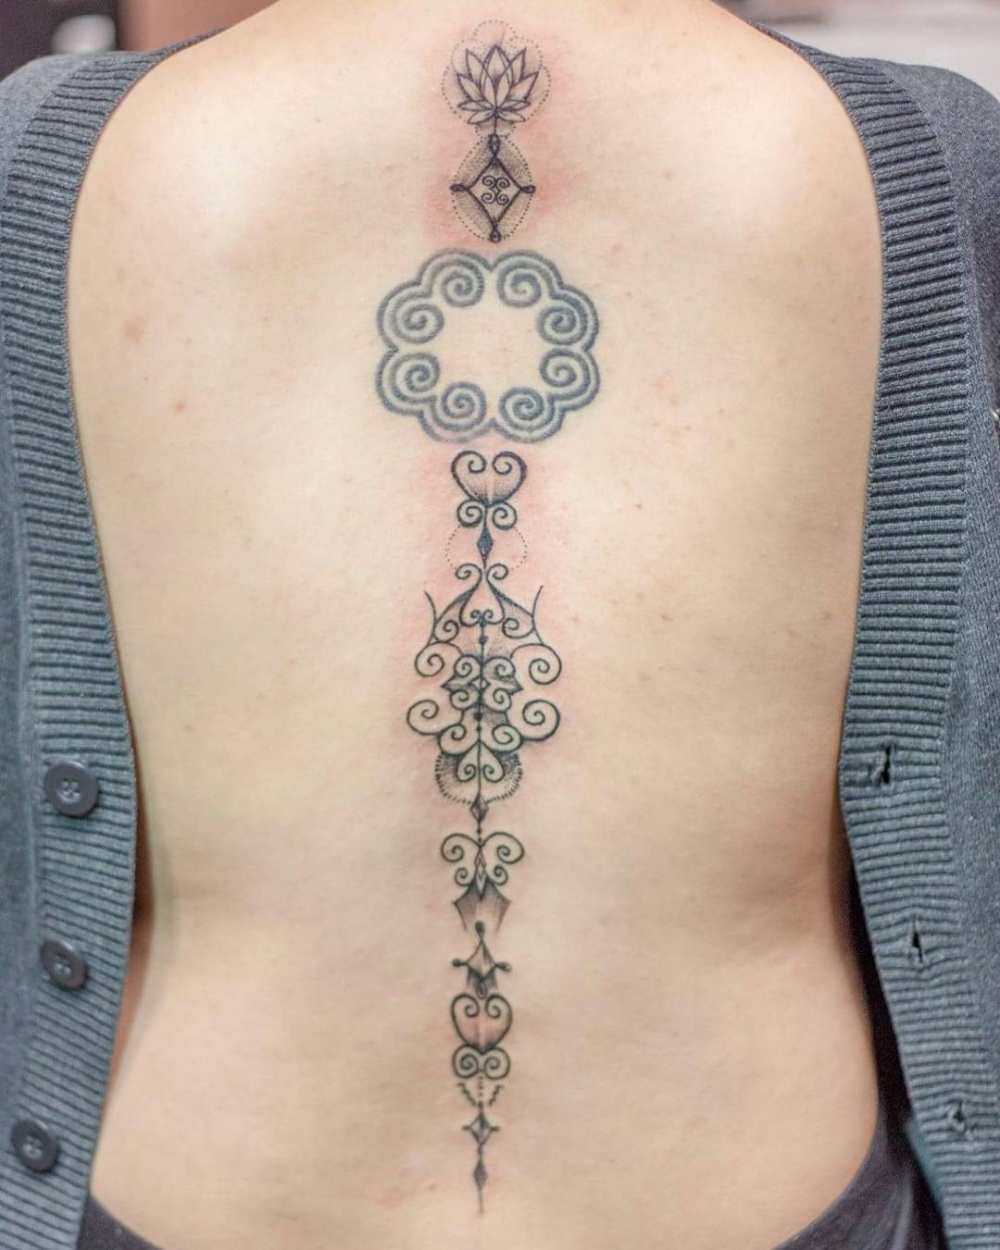 Pin By Christina Vang On Tattoo Inspo Hmong Tattoo Tattoo Designs Tattoos